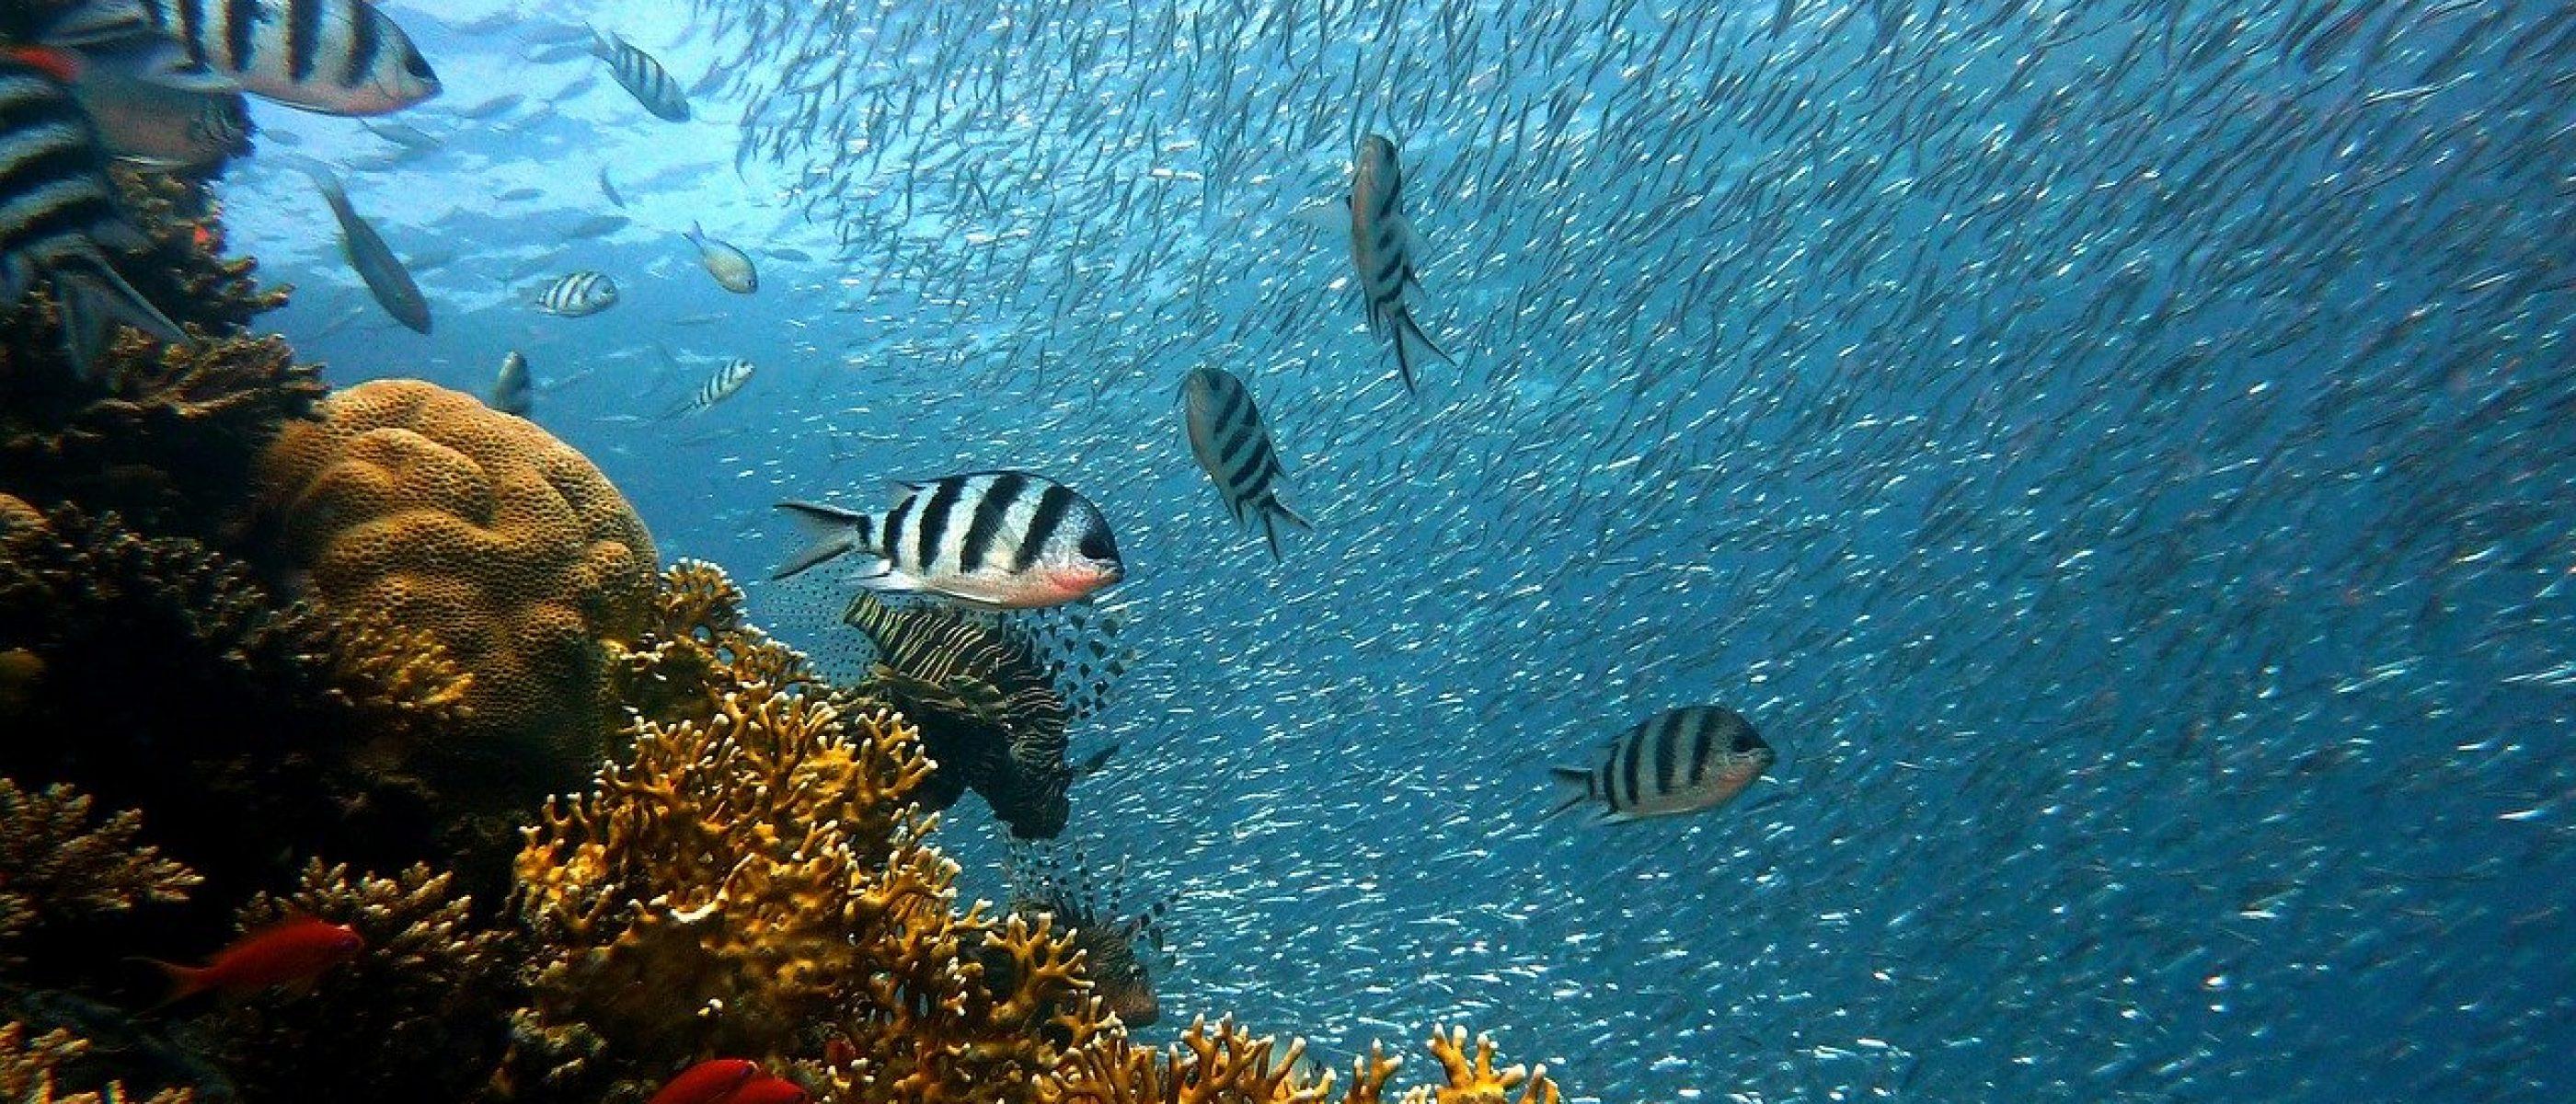 fish 378286 - 1280